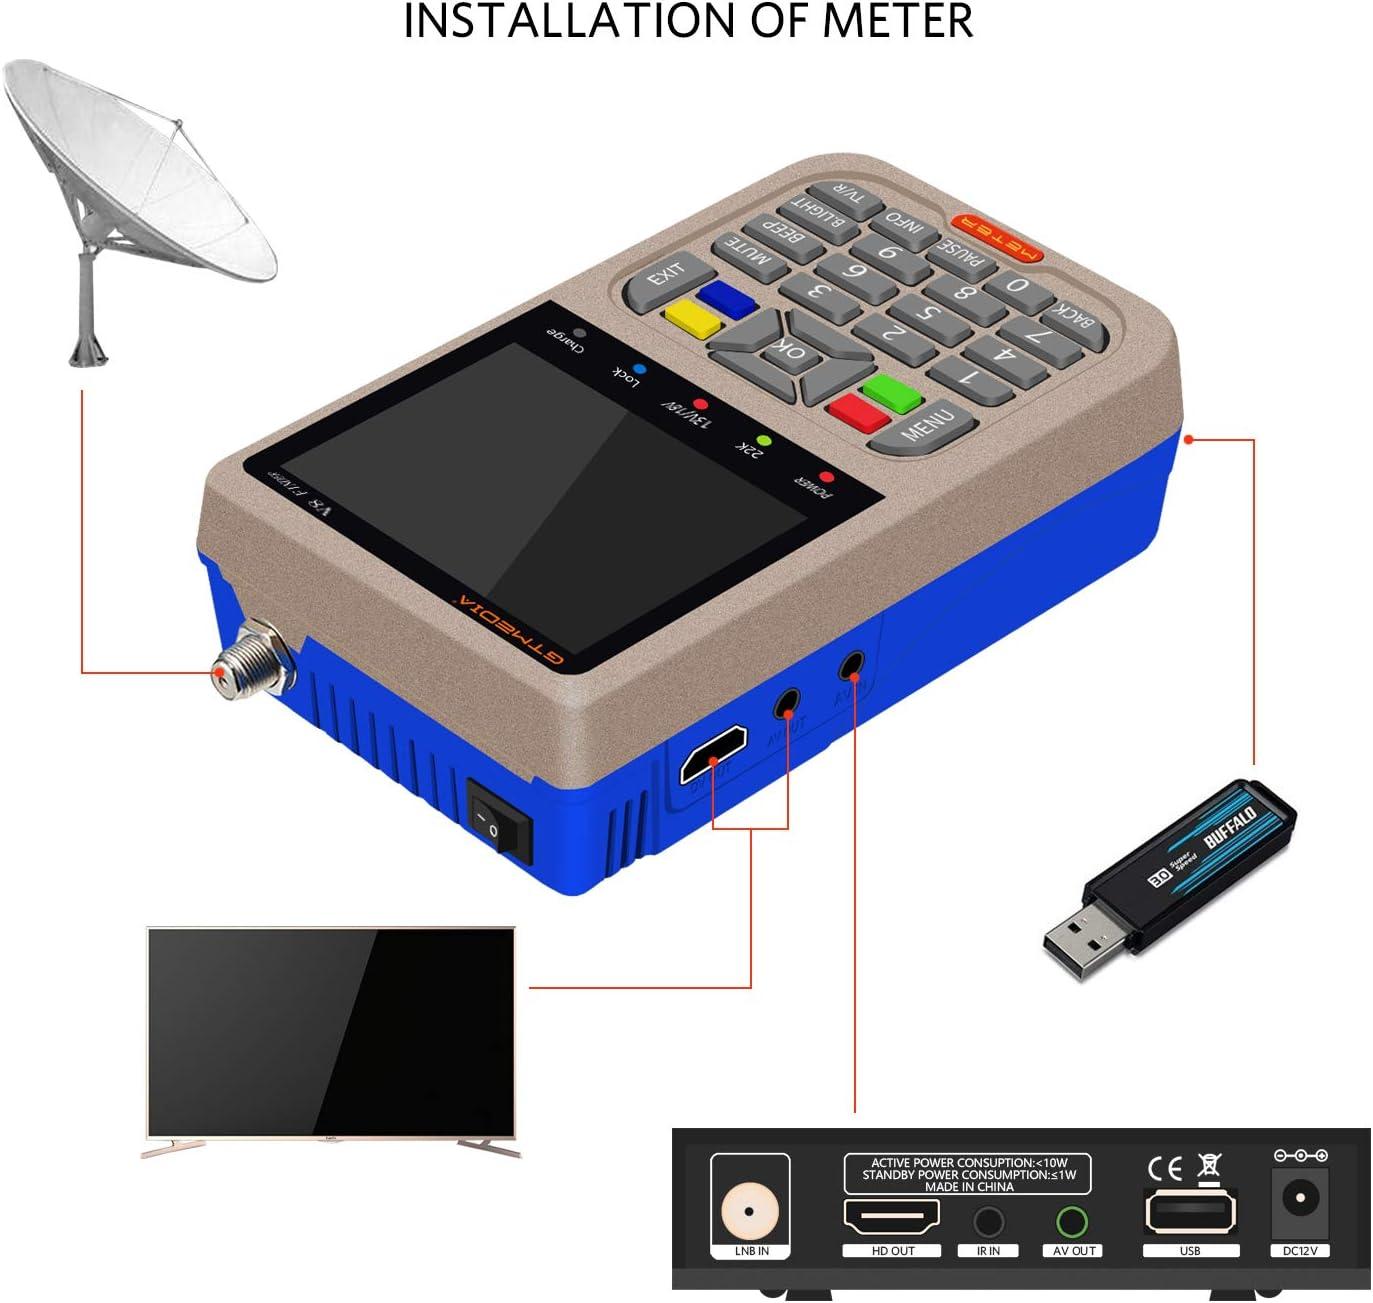 GTmedia V8 Satélite Finder DVB-S/DVB-S2 Localizador Buscador de Satélite FTA Satélite Receptor TV Digital HD 3.5